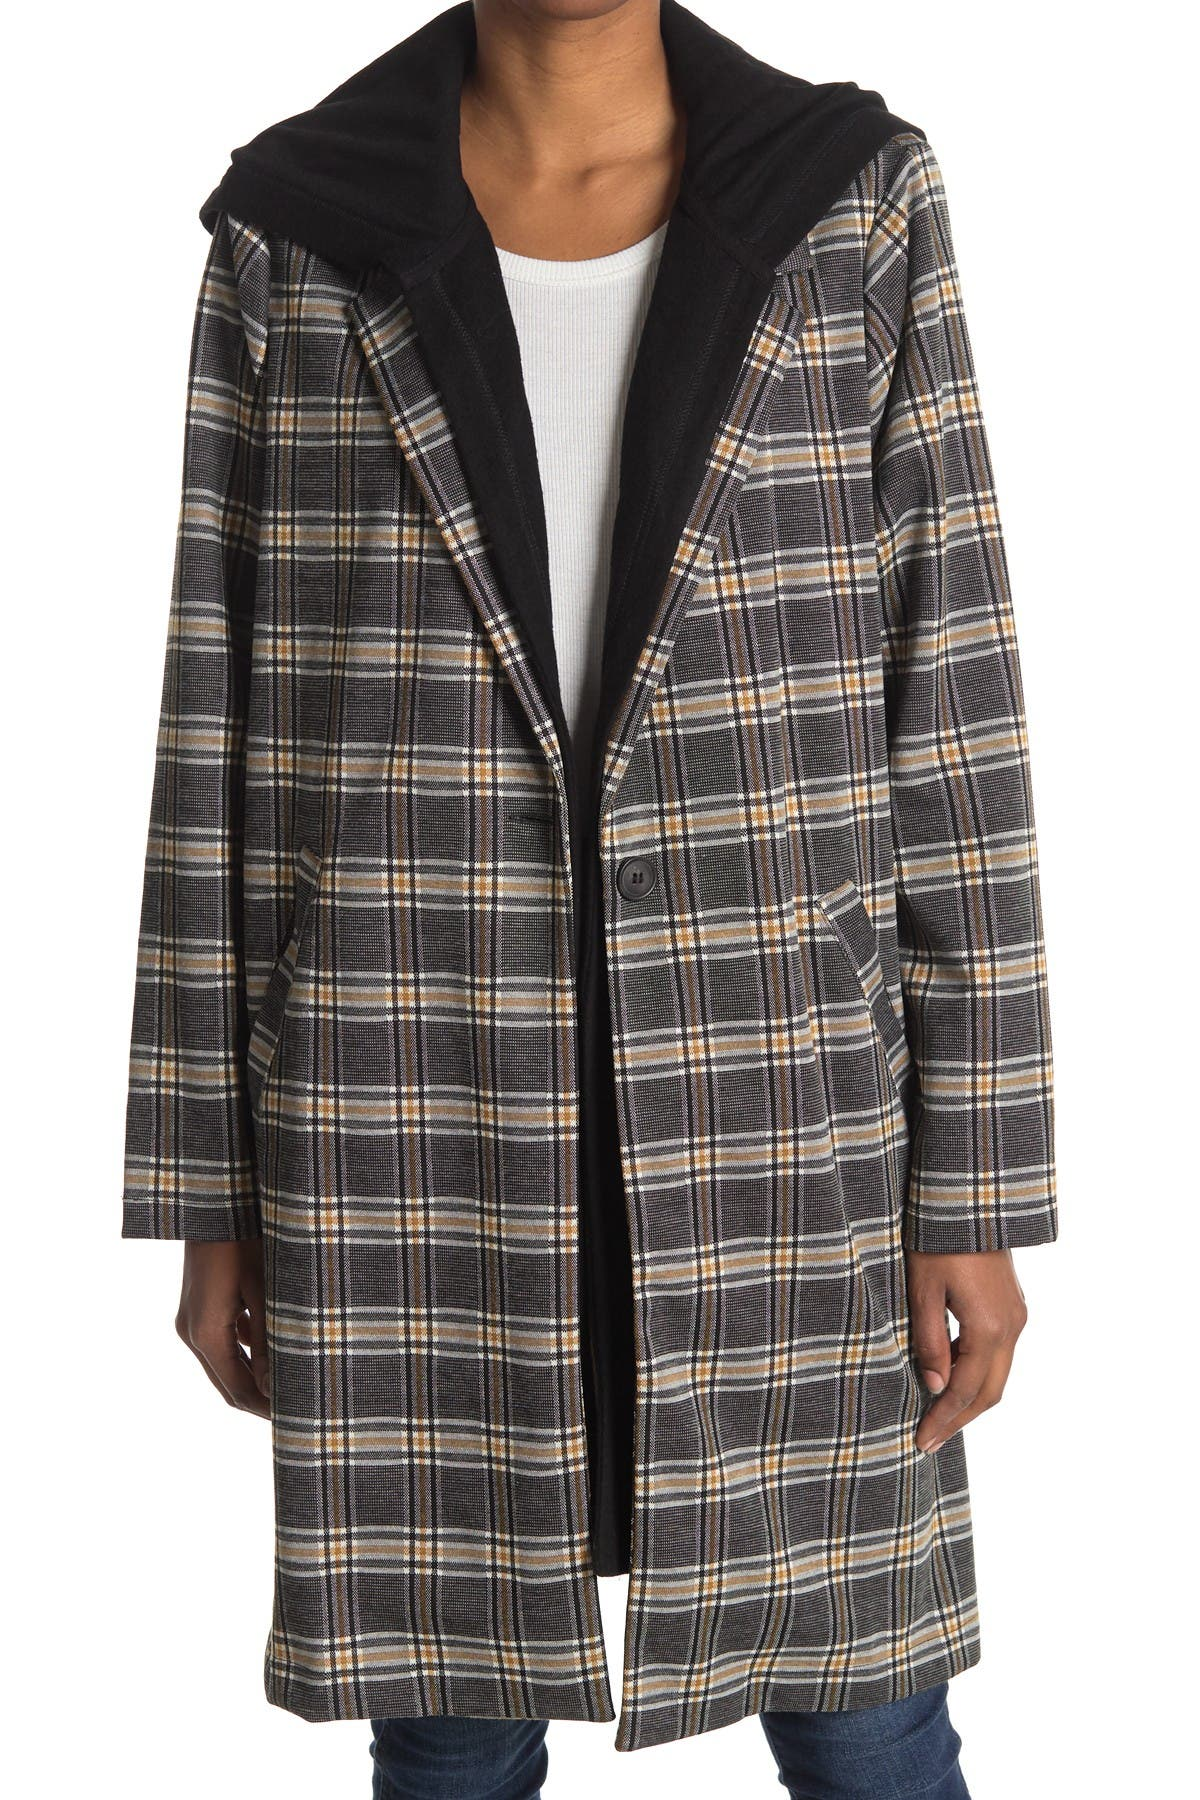 Image of MELLODAY Hooded Plaid Knit Coat